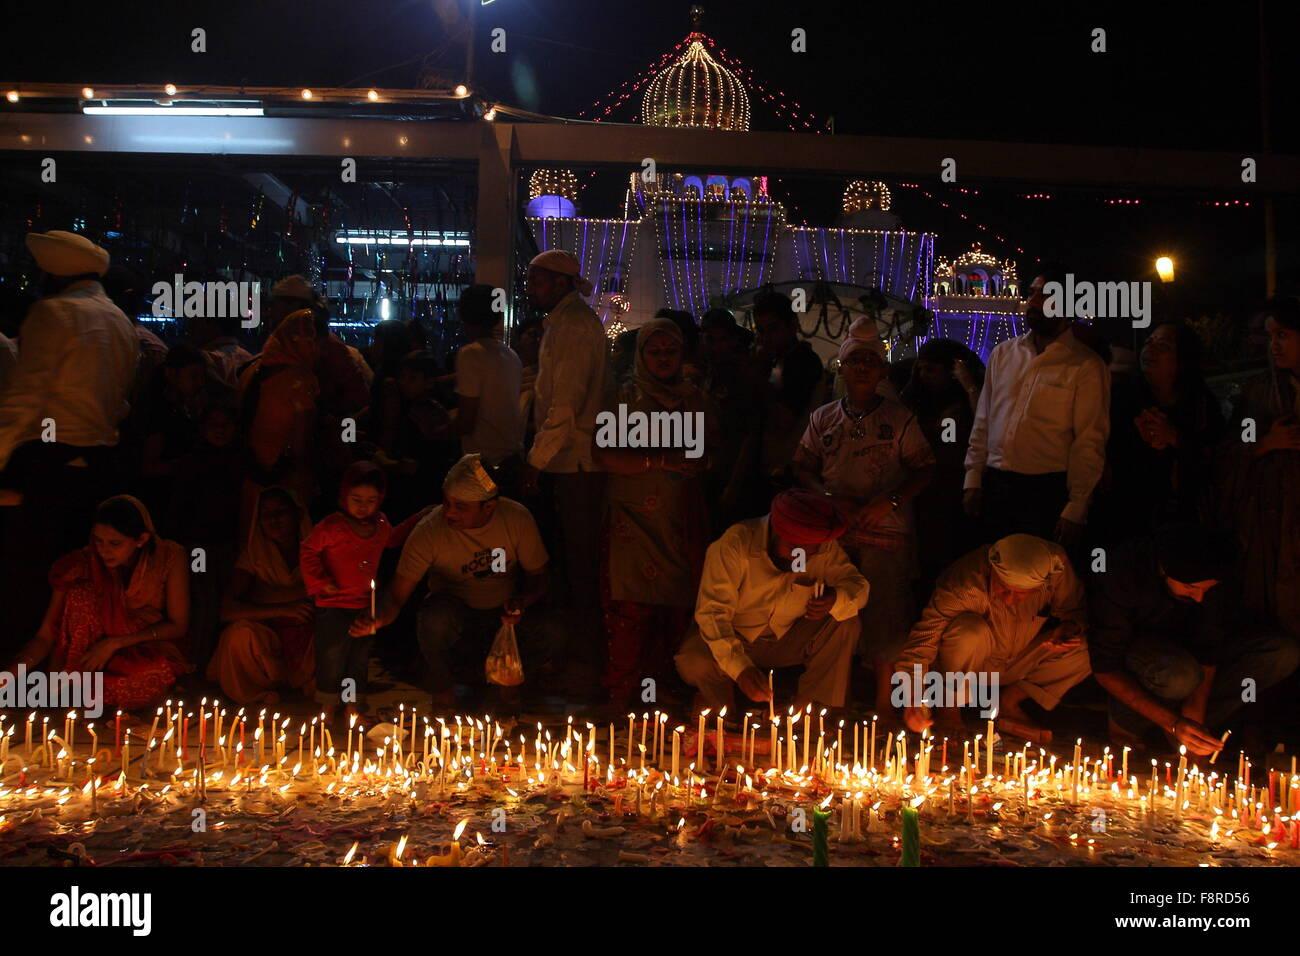 GURU PARAB, DELHI, INDIA - Stock Image